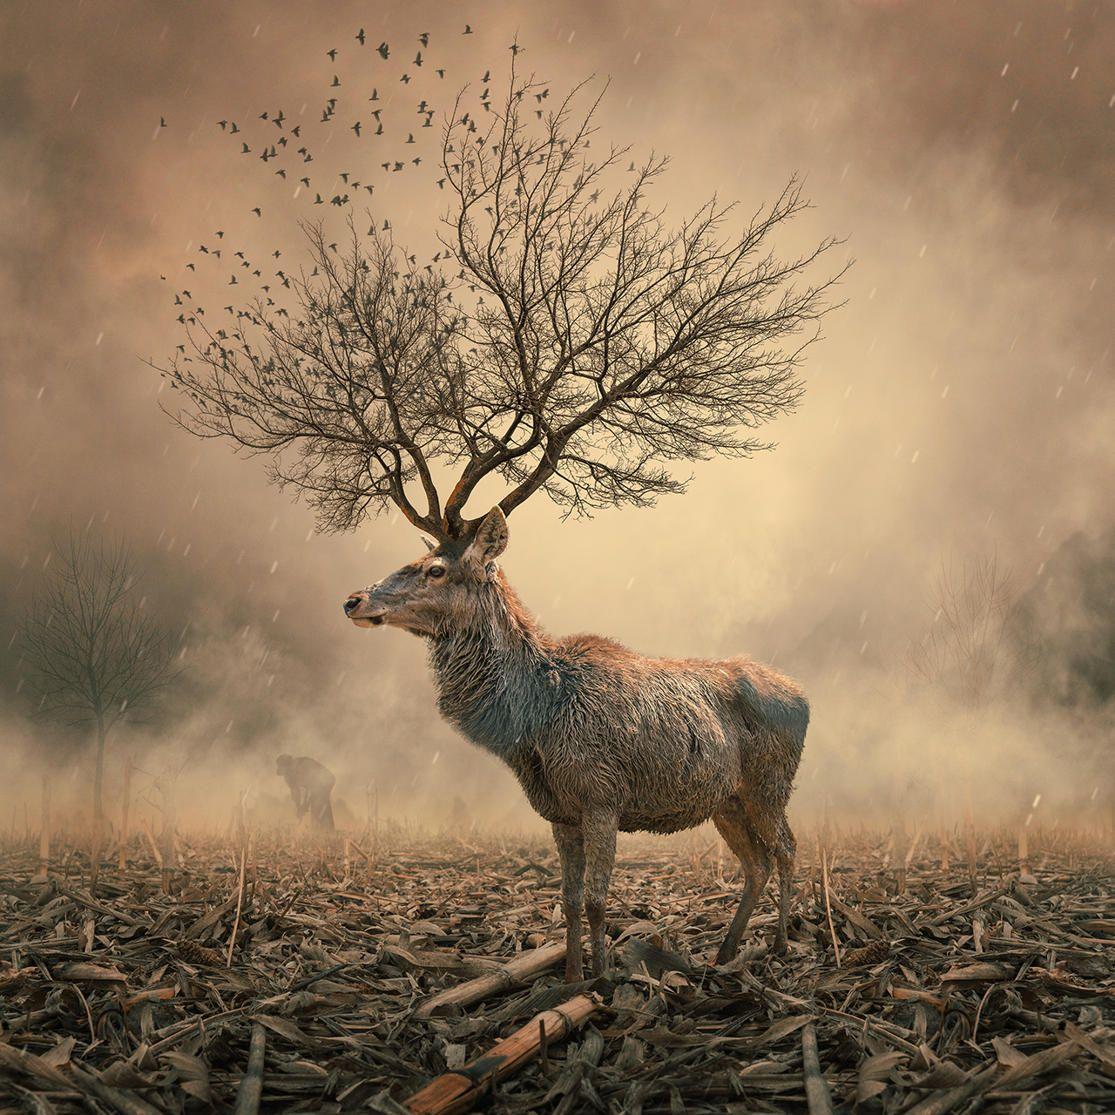 Deer by Ionuţ Caraş